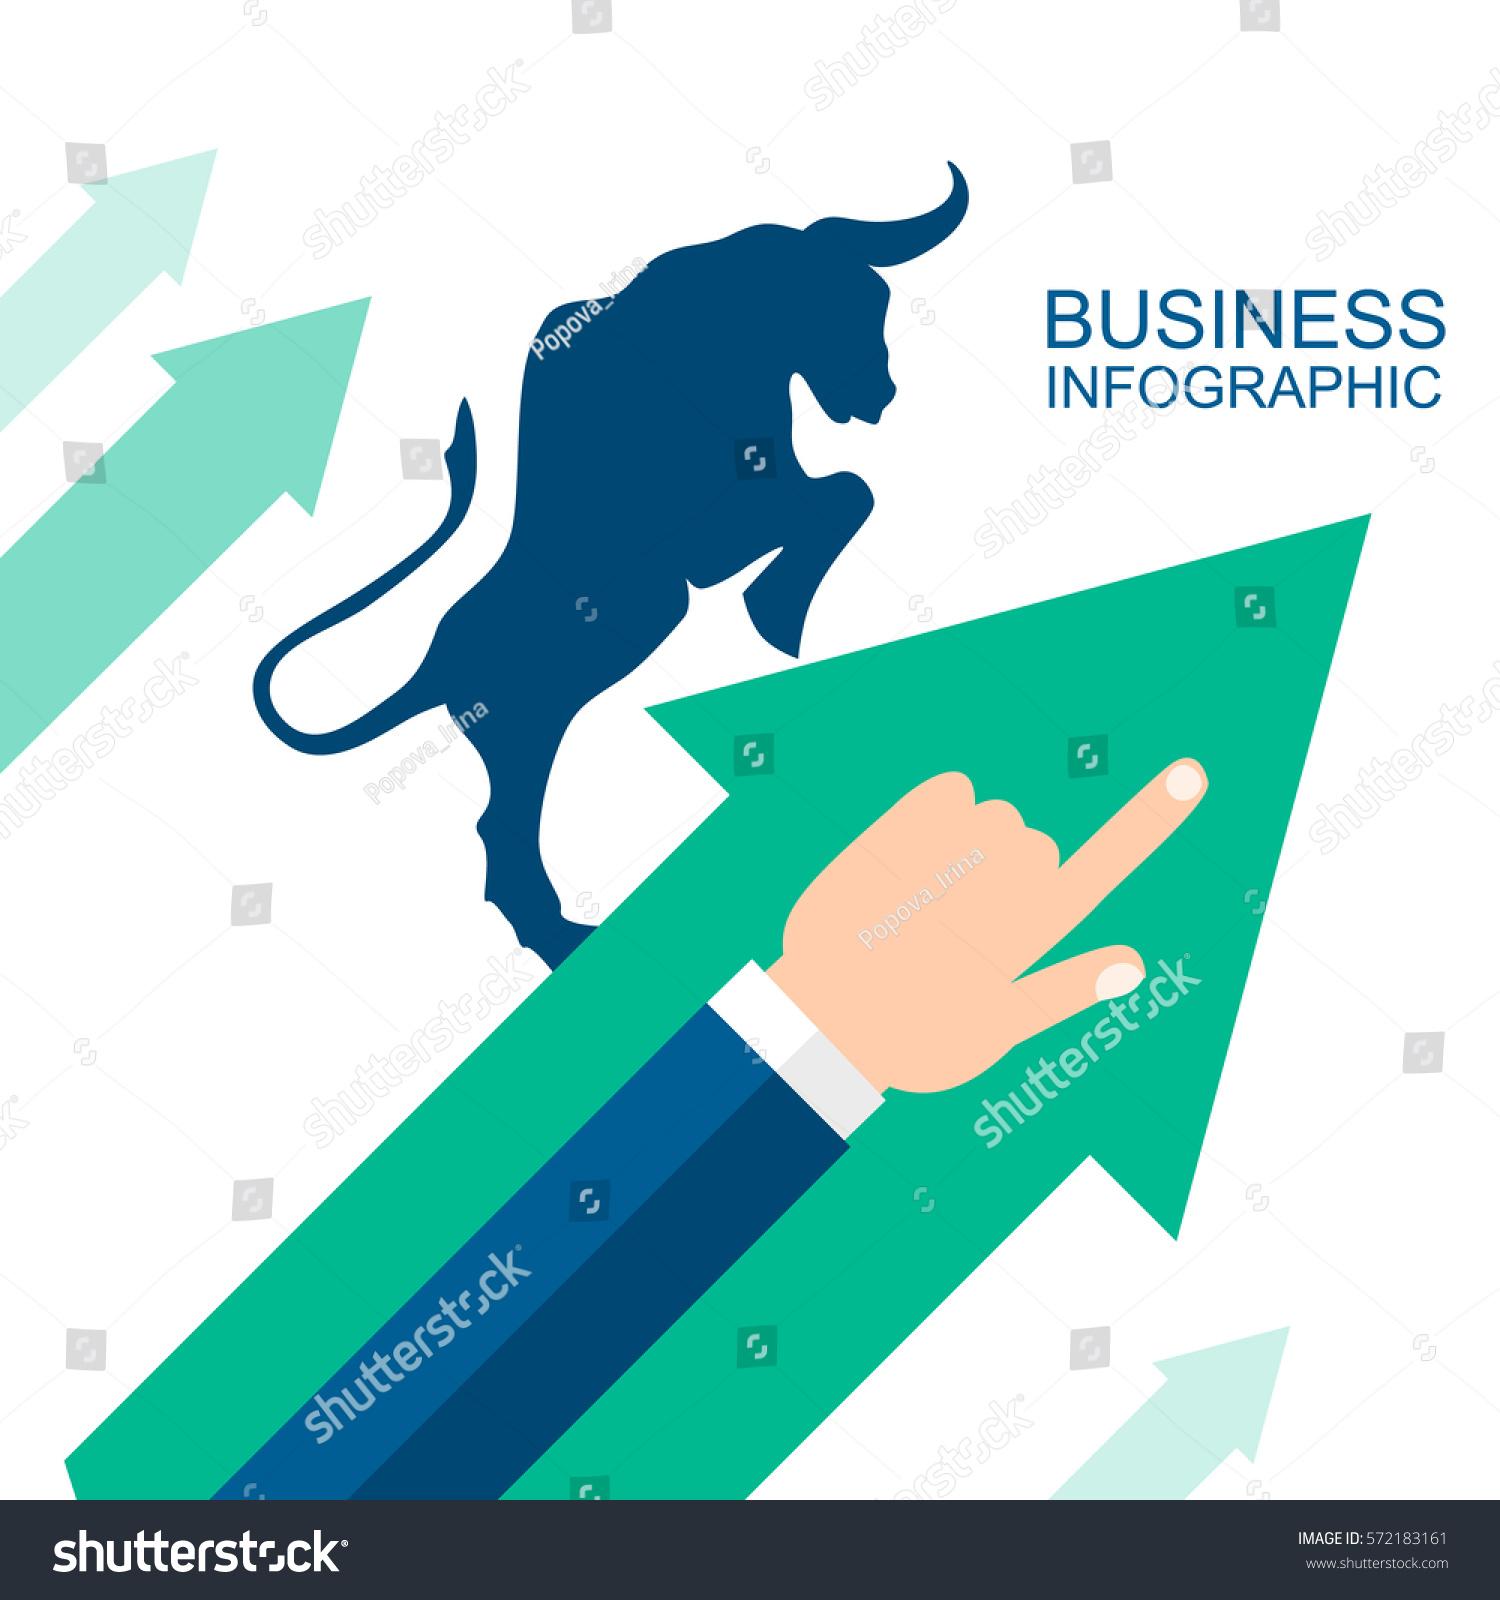 Bullish Symbols On Stock Market Vector Stock Vector Royalty Free